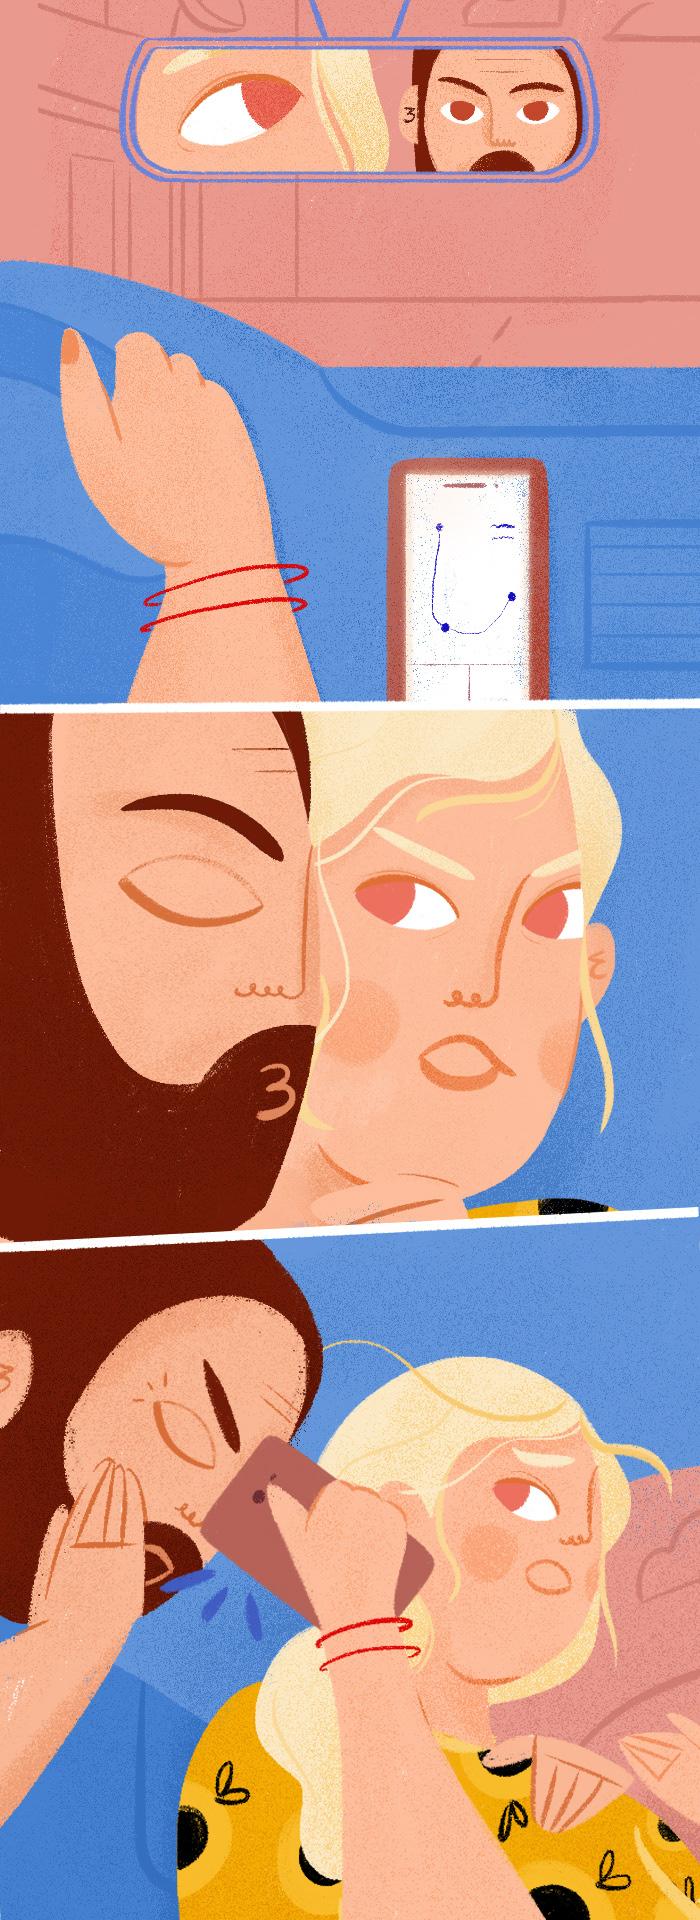 driver women Uber assault abuse sexualabuse ILLUSTRATION  digital digitalart